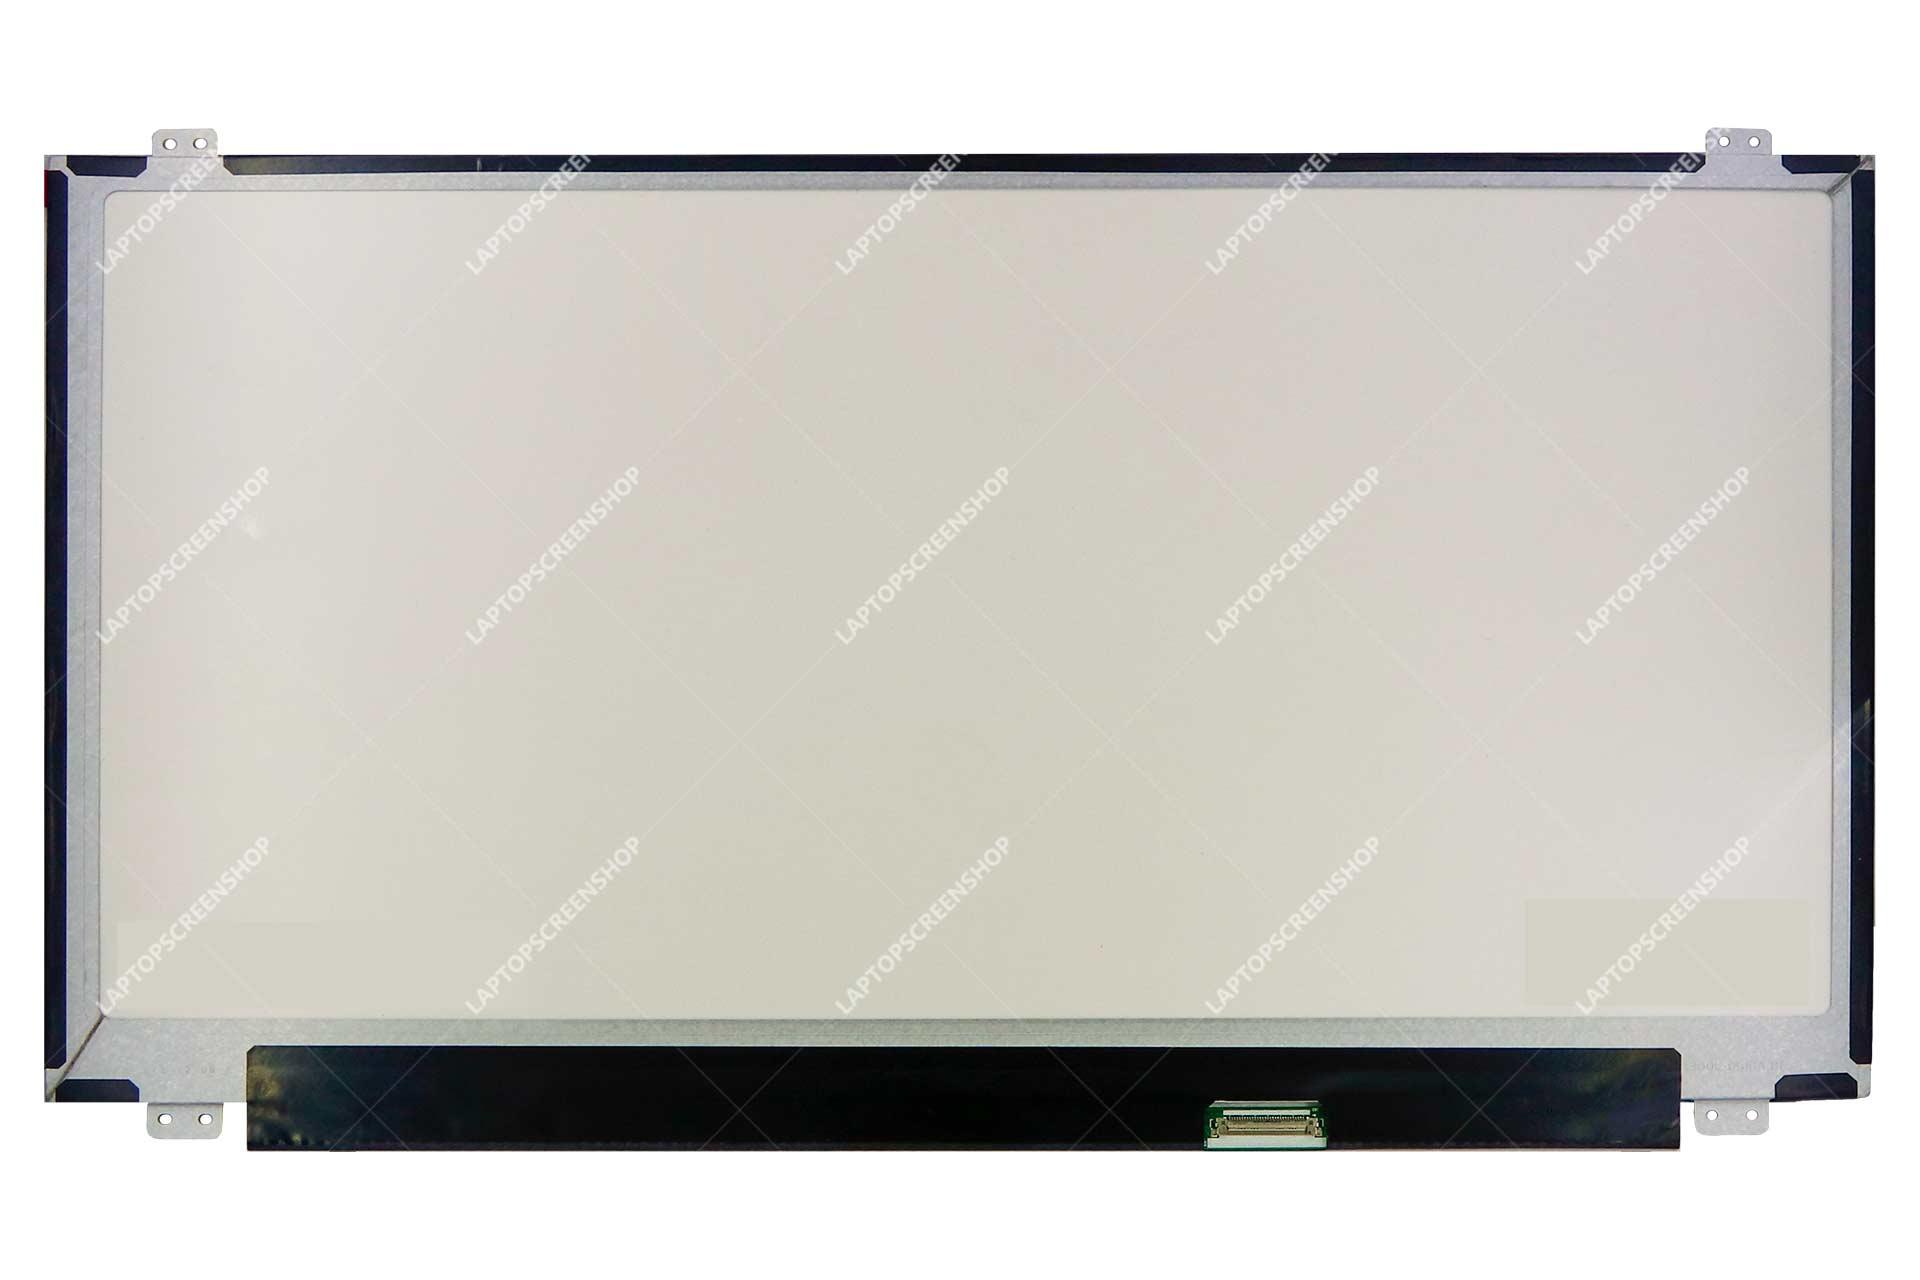 ACER-ASPIRE-E1-470-6682-LCD-LCD |HD|فروشگاه لپ تاپ اسکرين | تعمير لپ تاپ